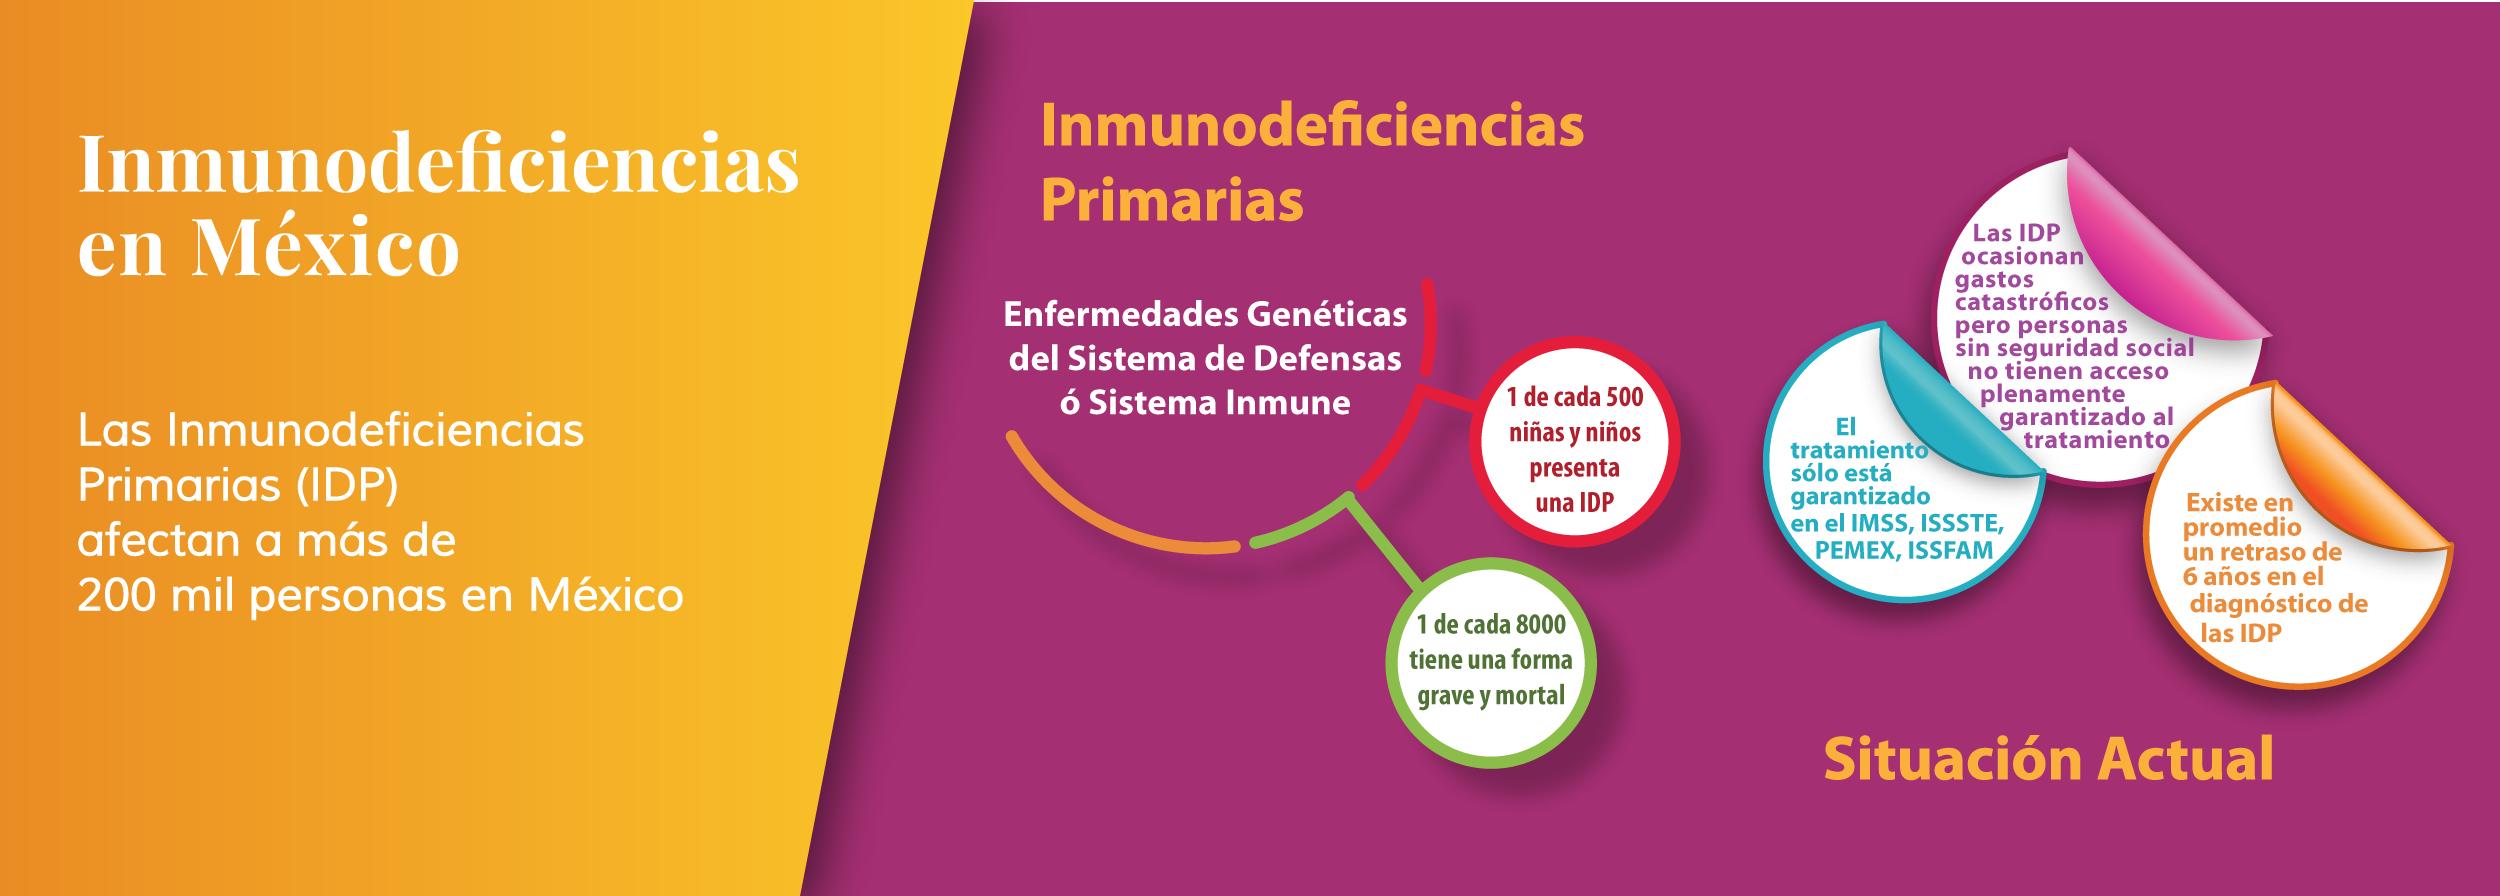 Inmunodeficiencias en México